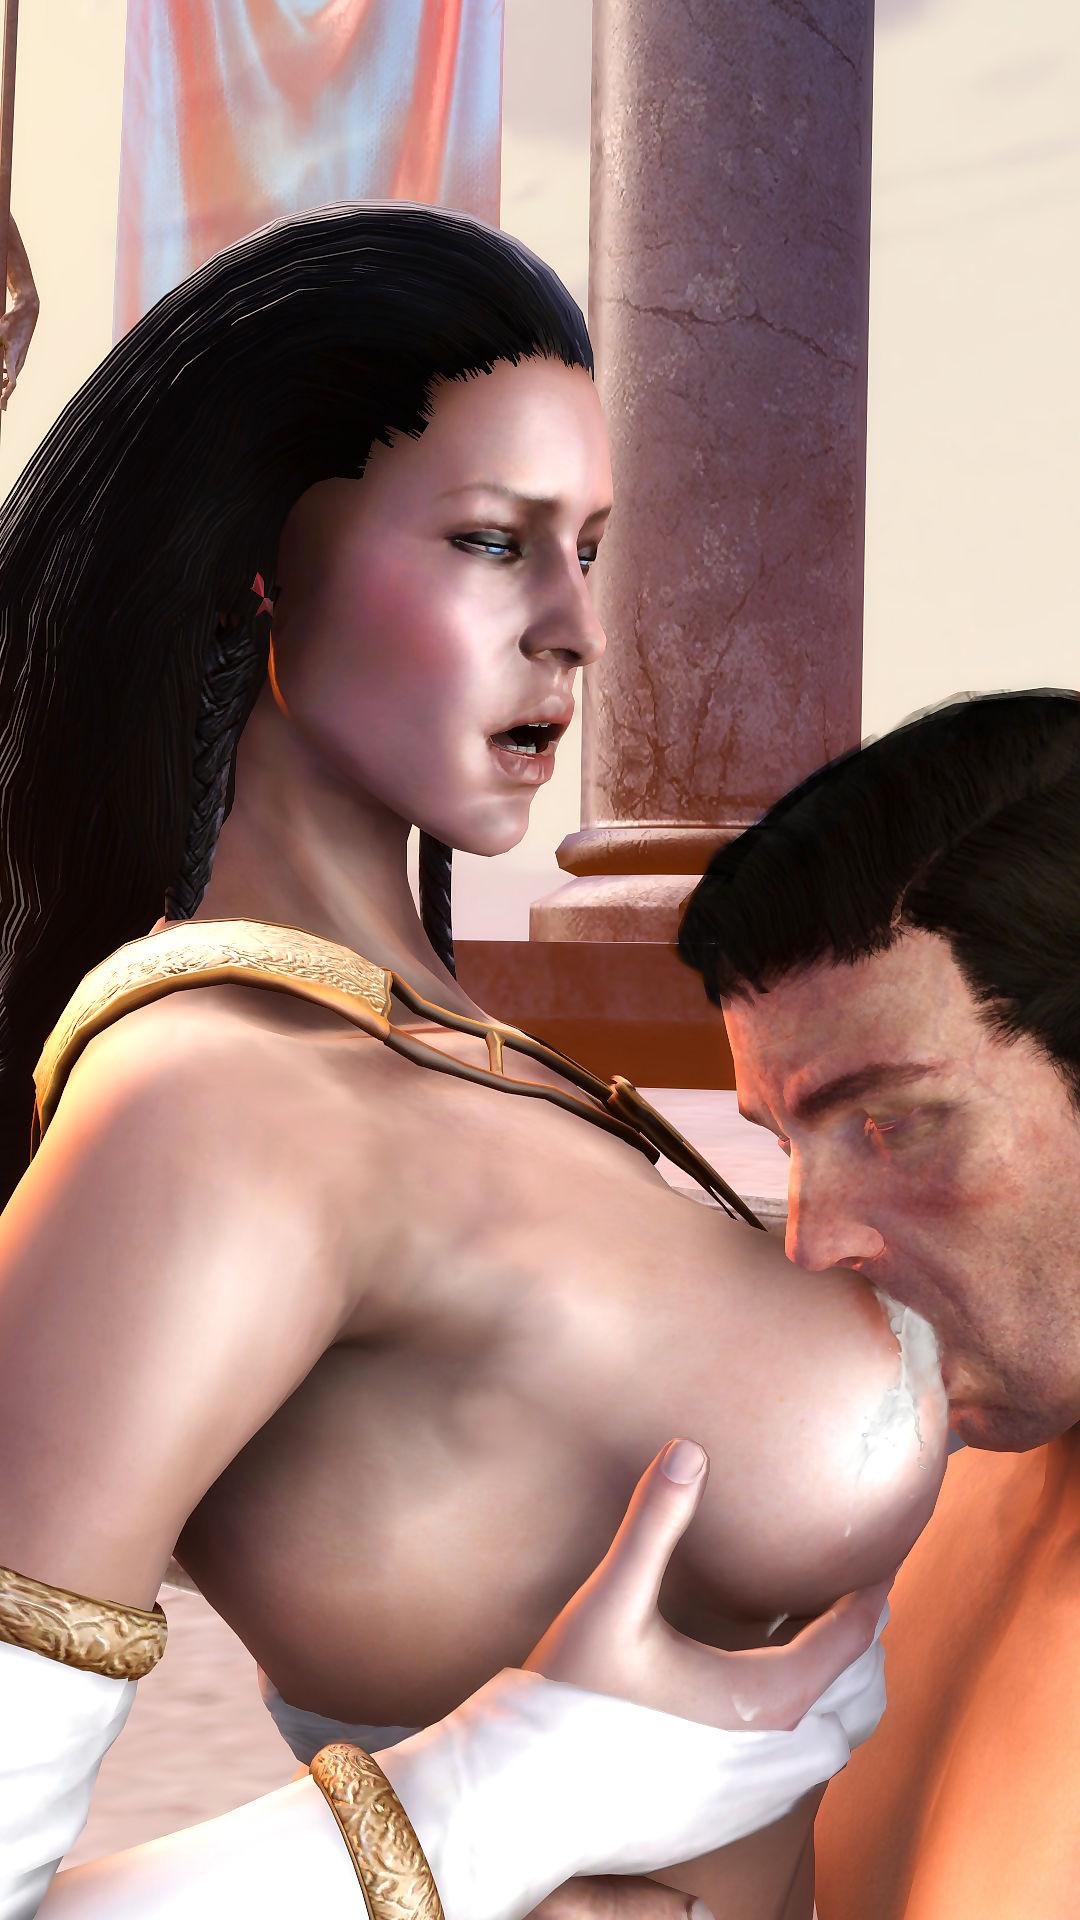 Diana Bruce BMWW WonderBat - Injustice/Injustice2/Arkham/DC - loyalty 3